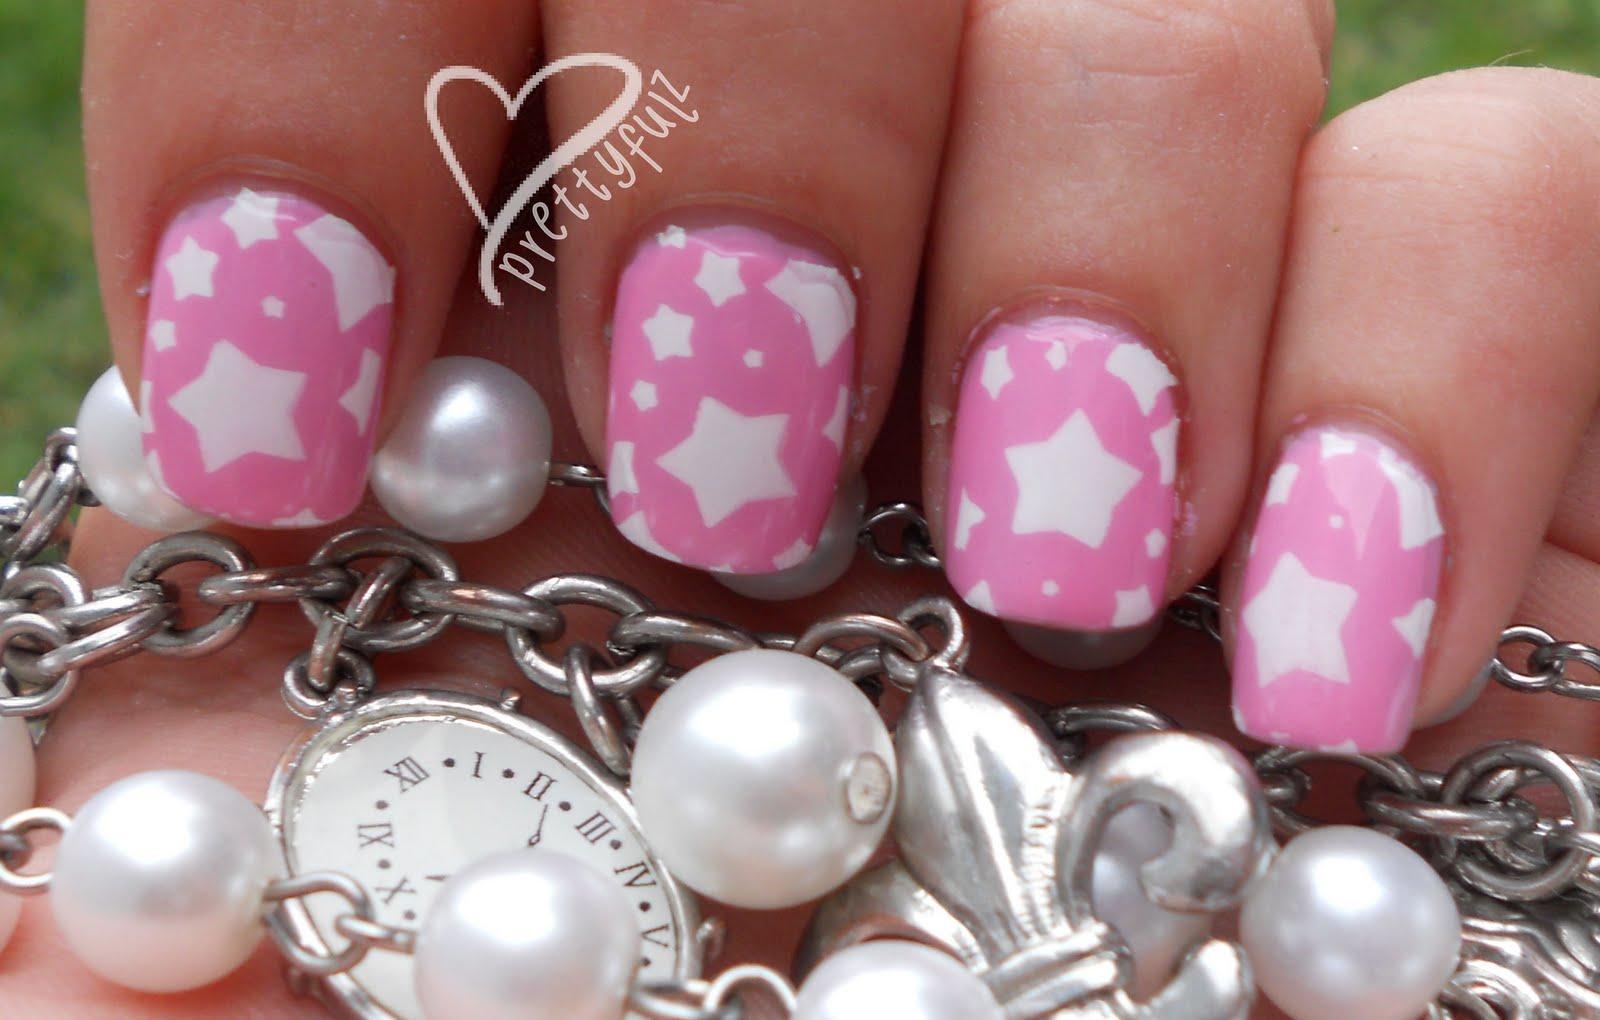 Cute Nail Designs For Short Nails - Pccala